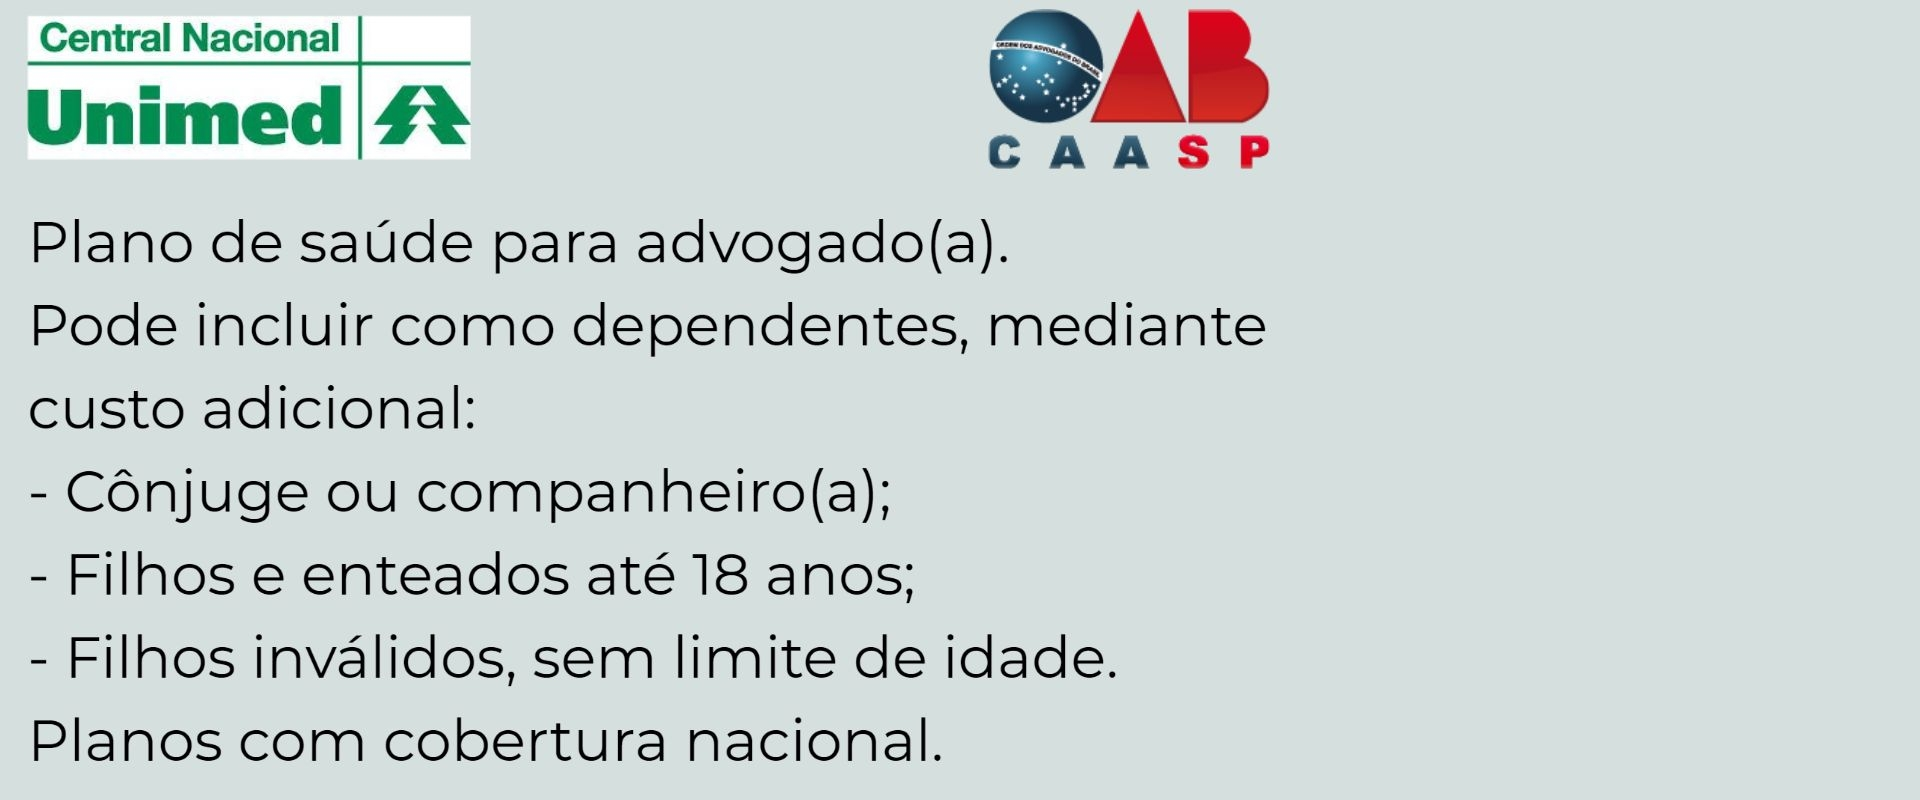 Unimed CAASP Mirassol